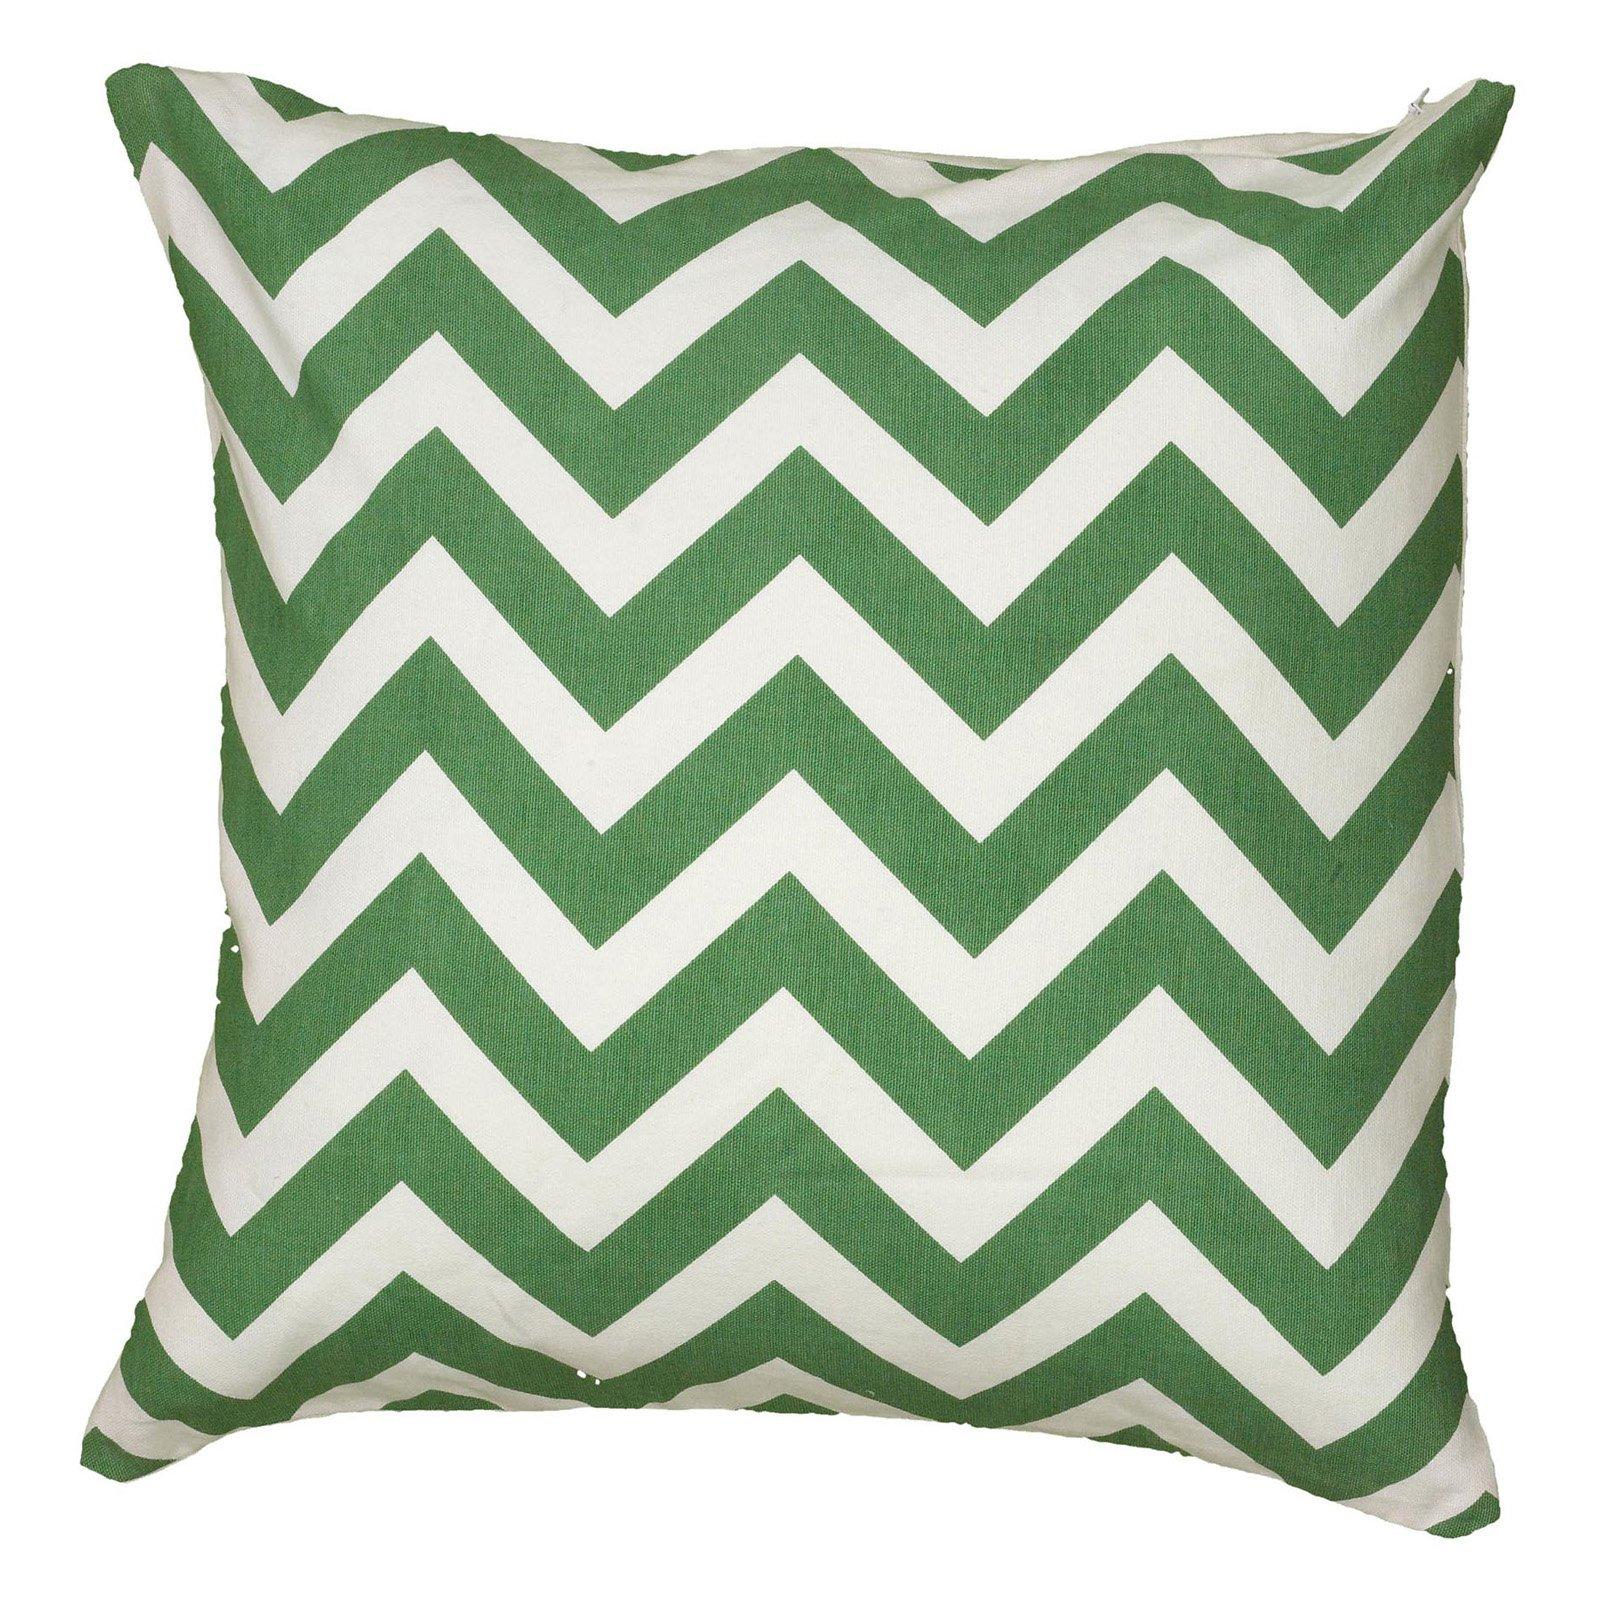 "Rizzy Home chevron18"" x 18""Cottondecorative filled pillow"